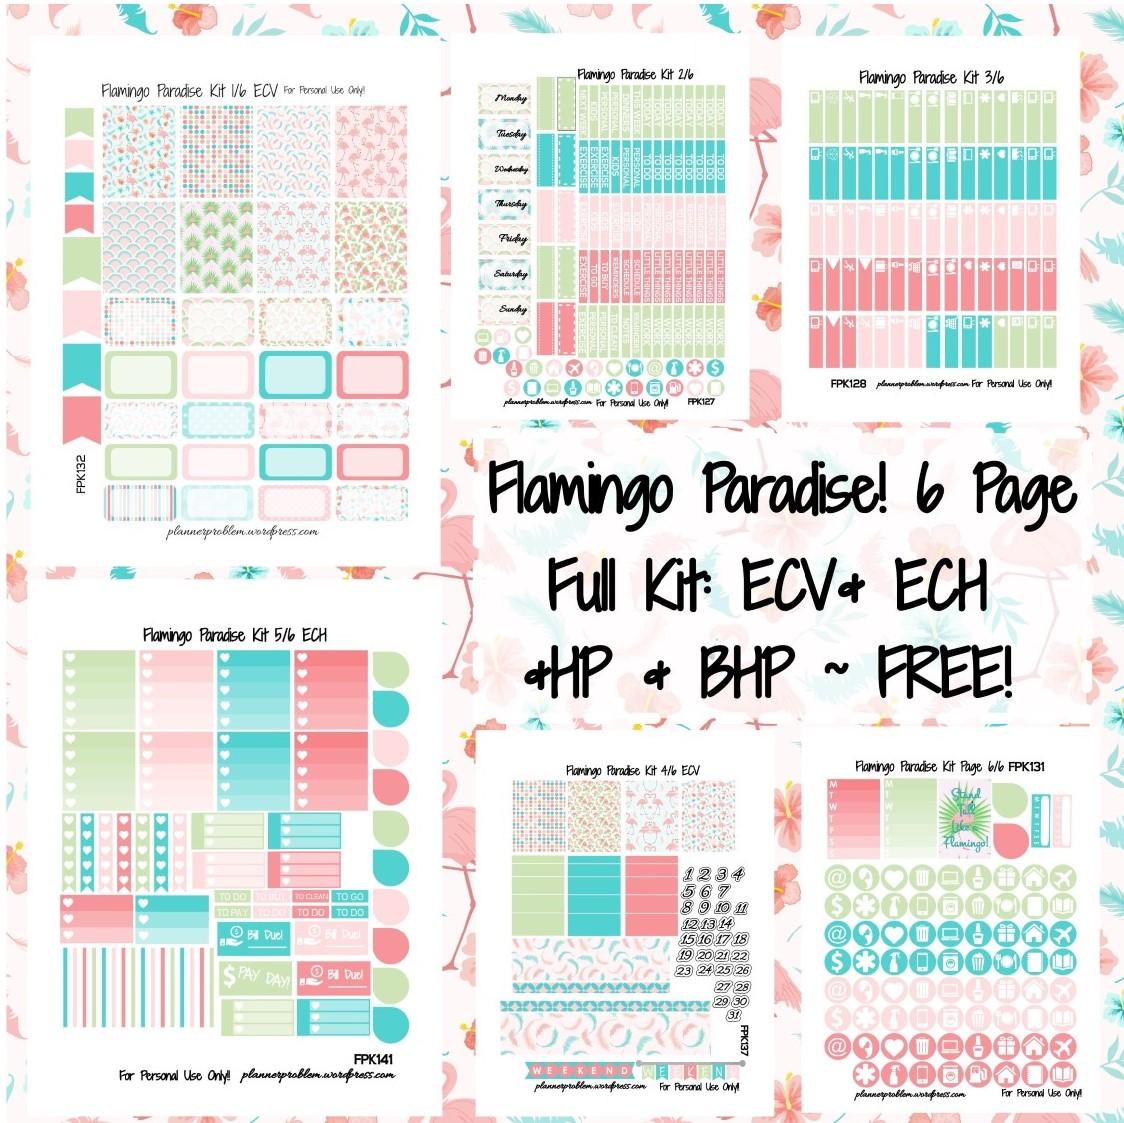 Flamingo Paradise Kit! | Free Printable Planner Stickers ...